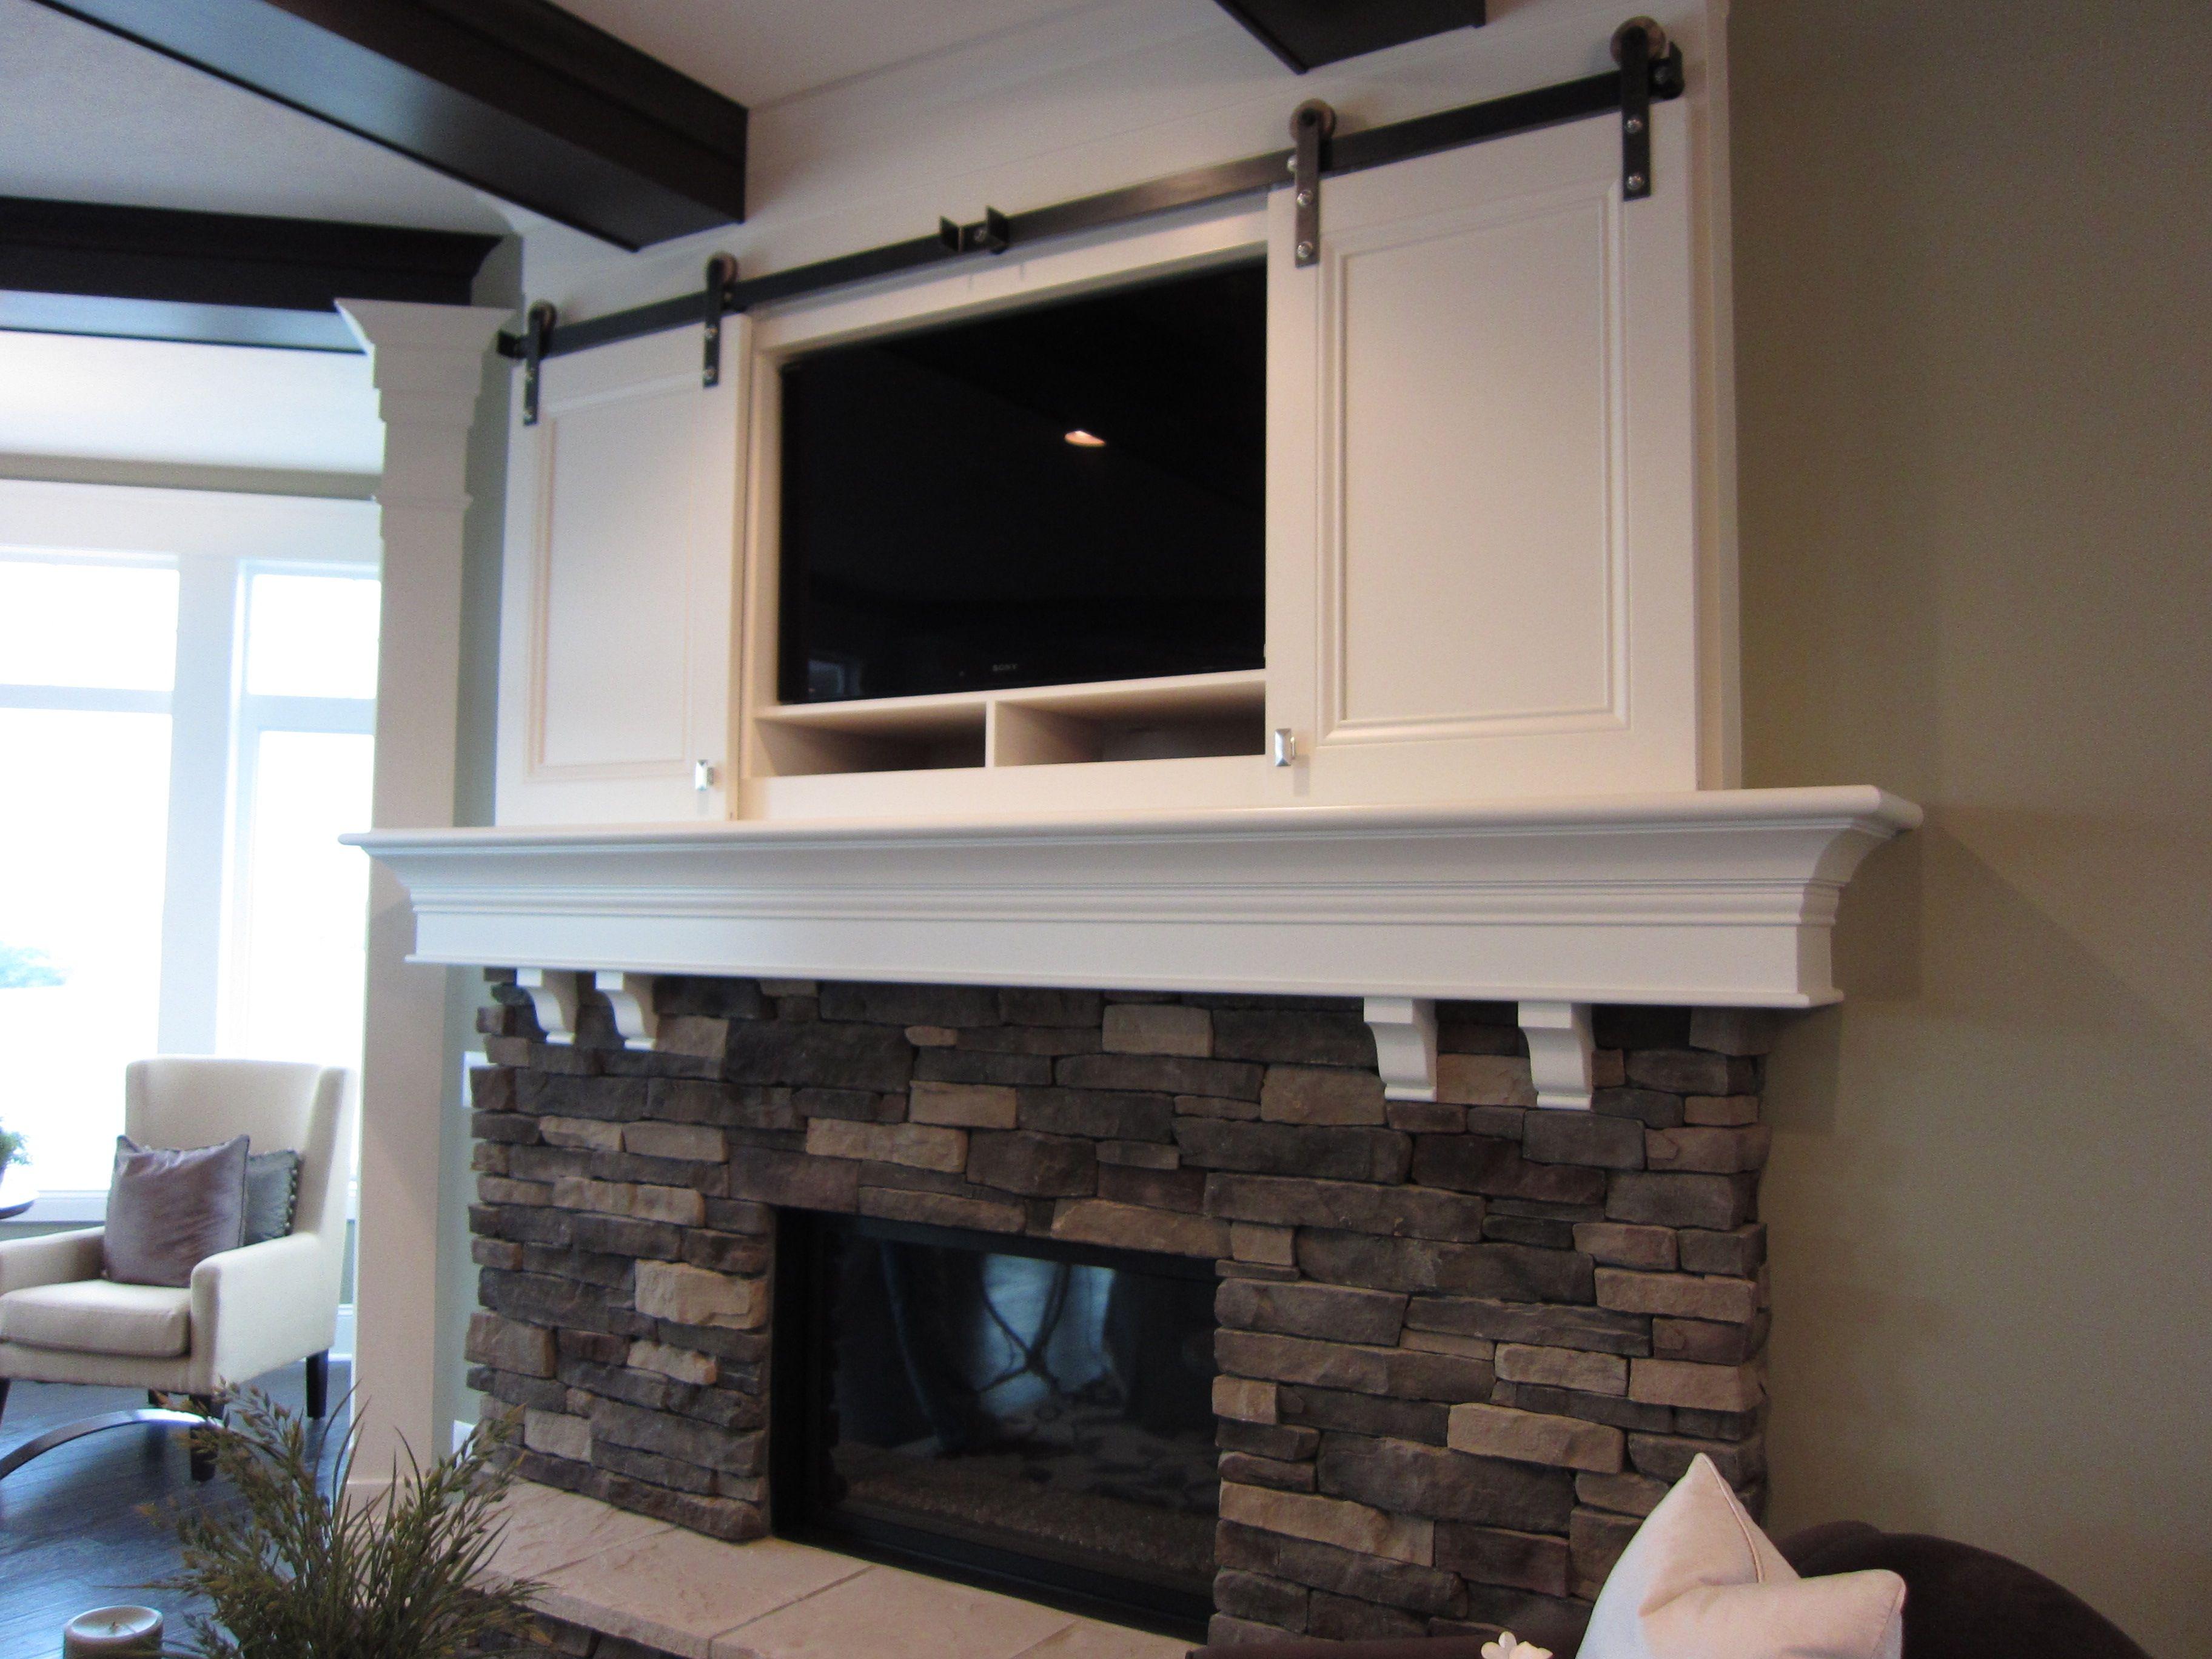 Fireplace Frame Ideas Elegant Fireplace Tv Mantel Ideas Best 25 Tv Above Fireplace Ideas